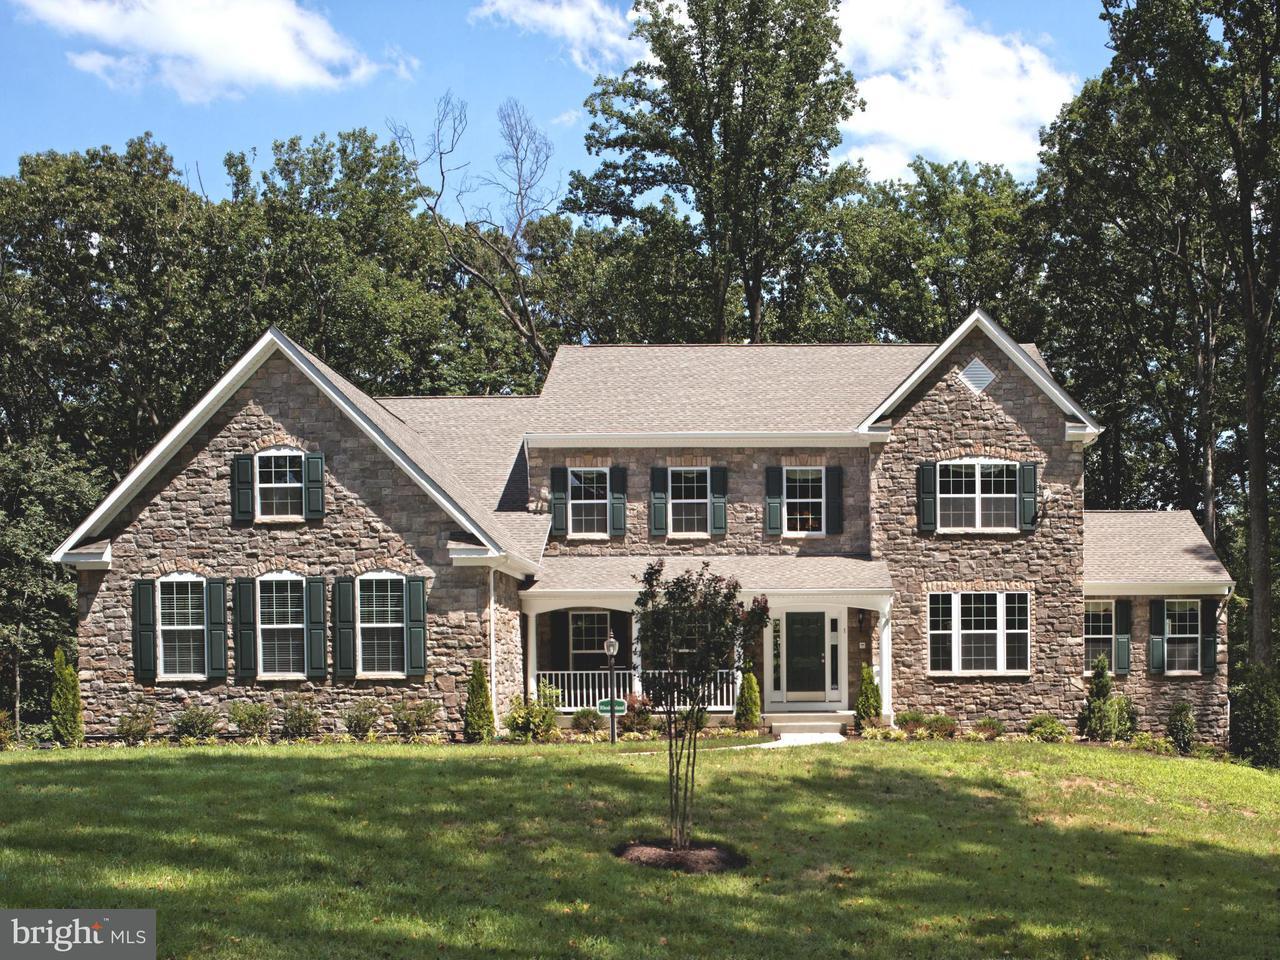 独户住宅 为 销售 在 1 LAURNIC Drive 1 LAURNIC Drive Reisterstown, 马里兰州 21136 美国